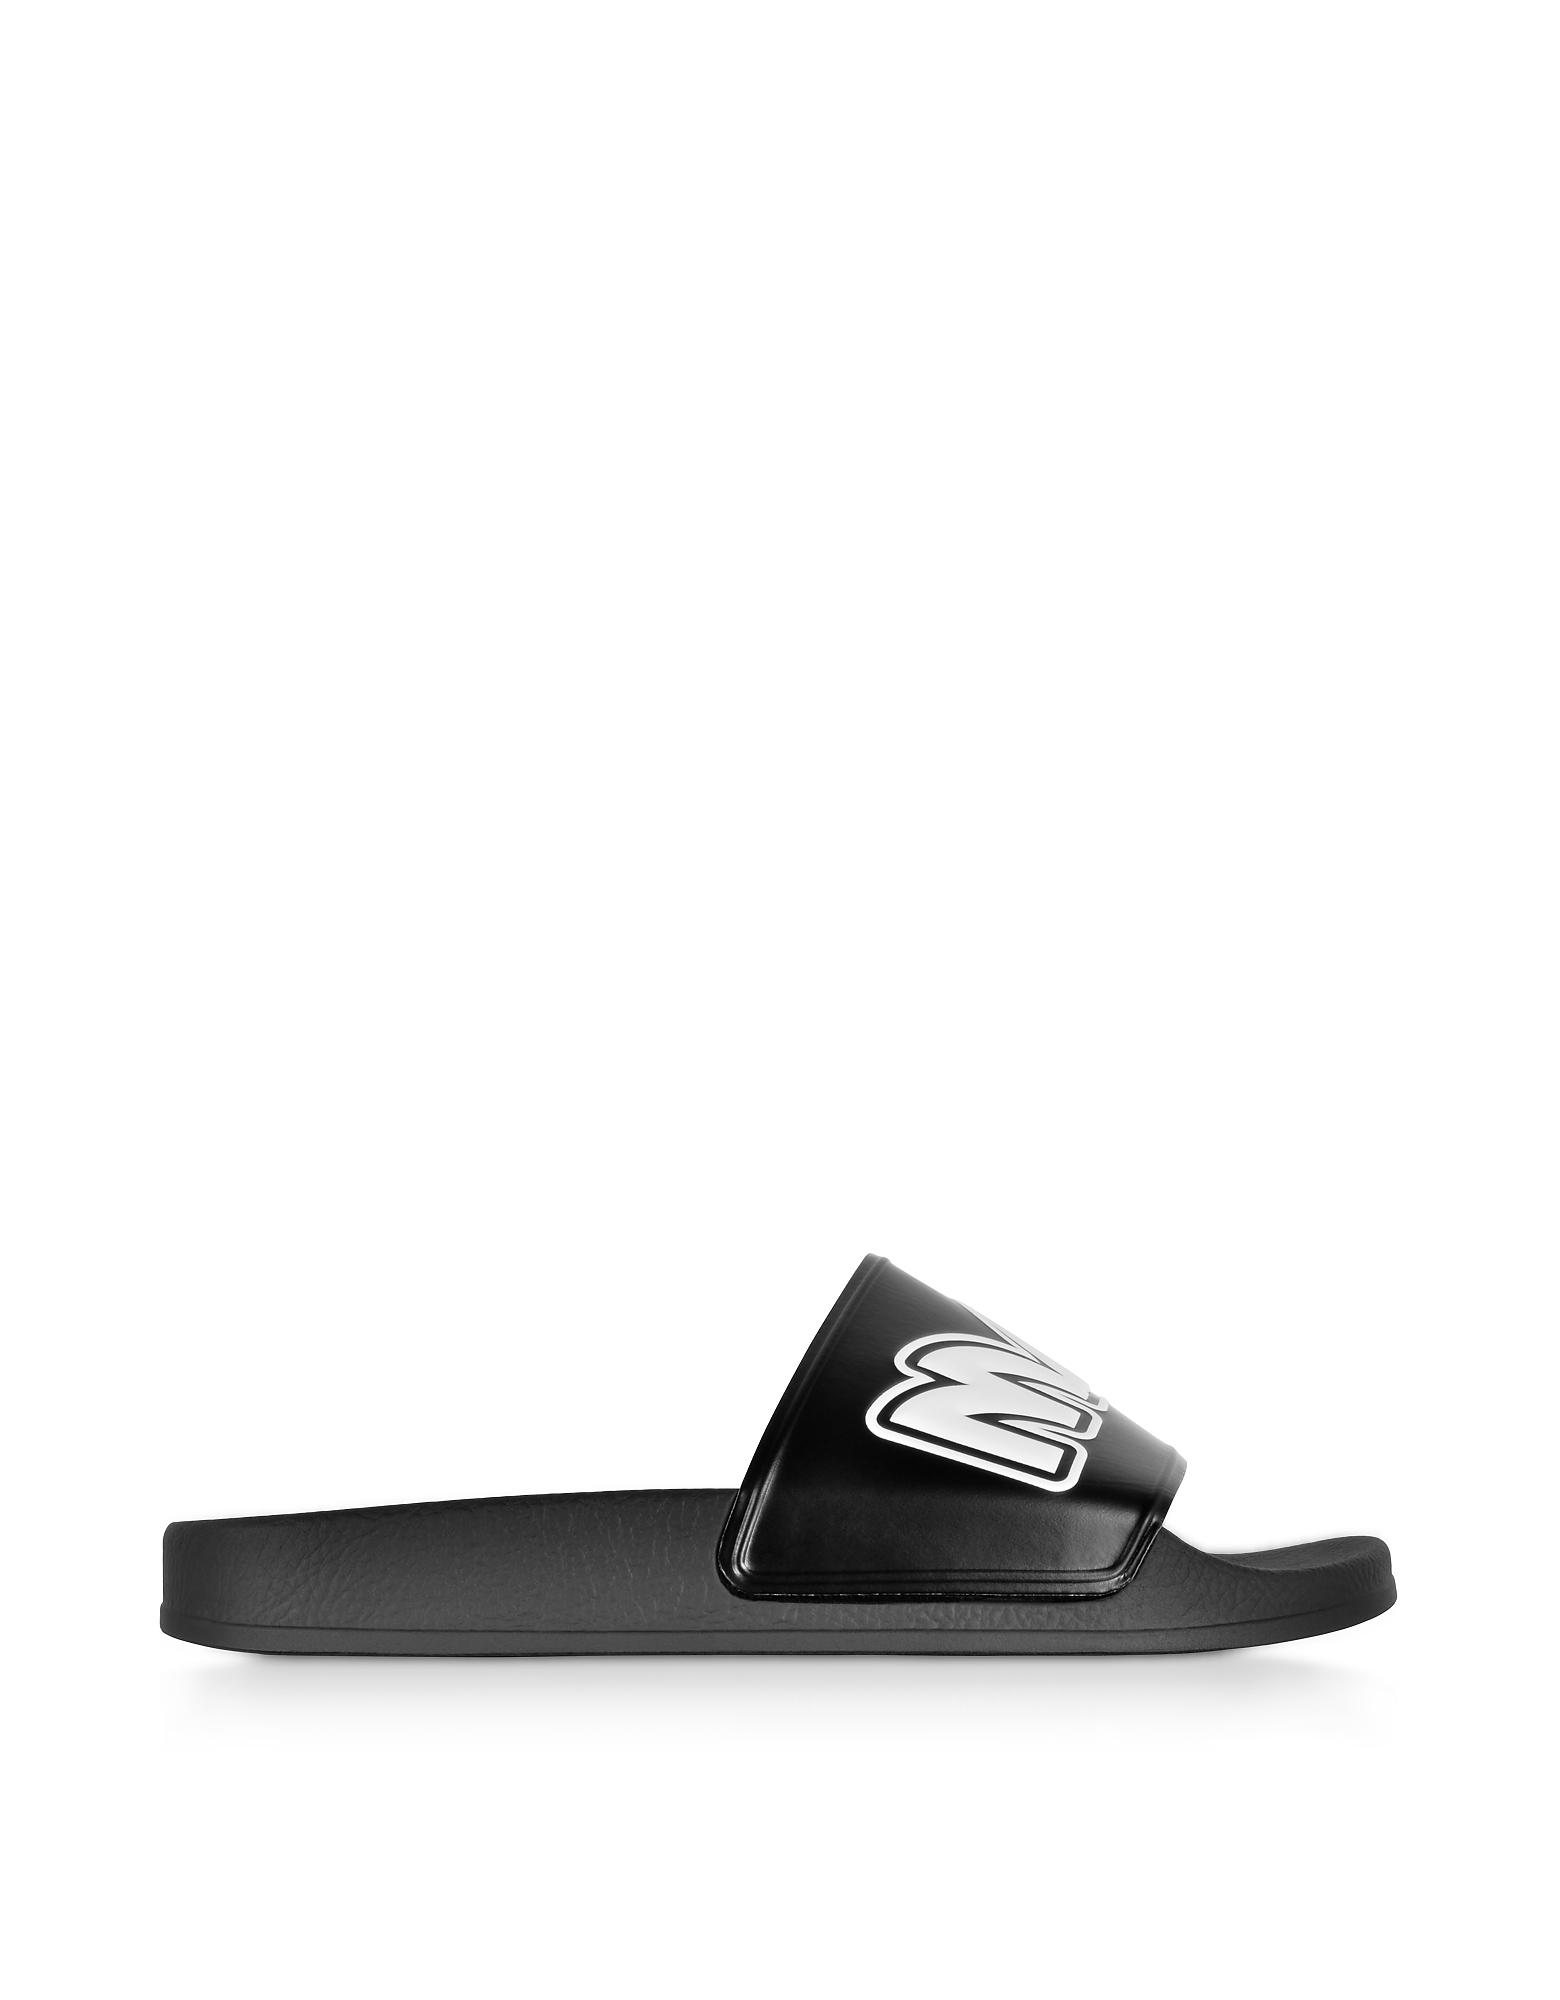 Black & White Chrissie Slide Sandals